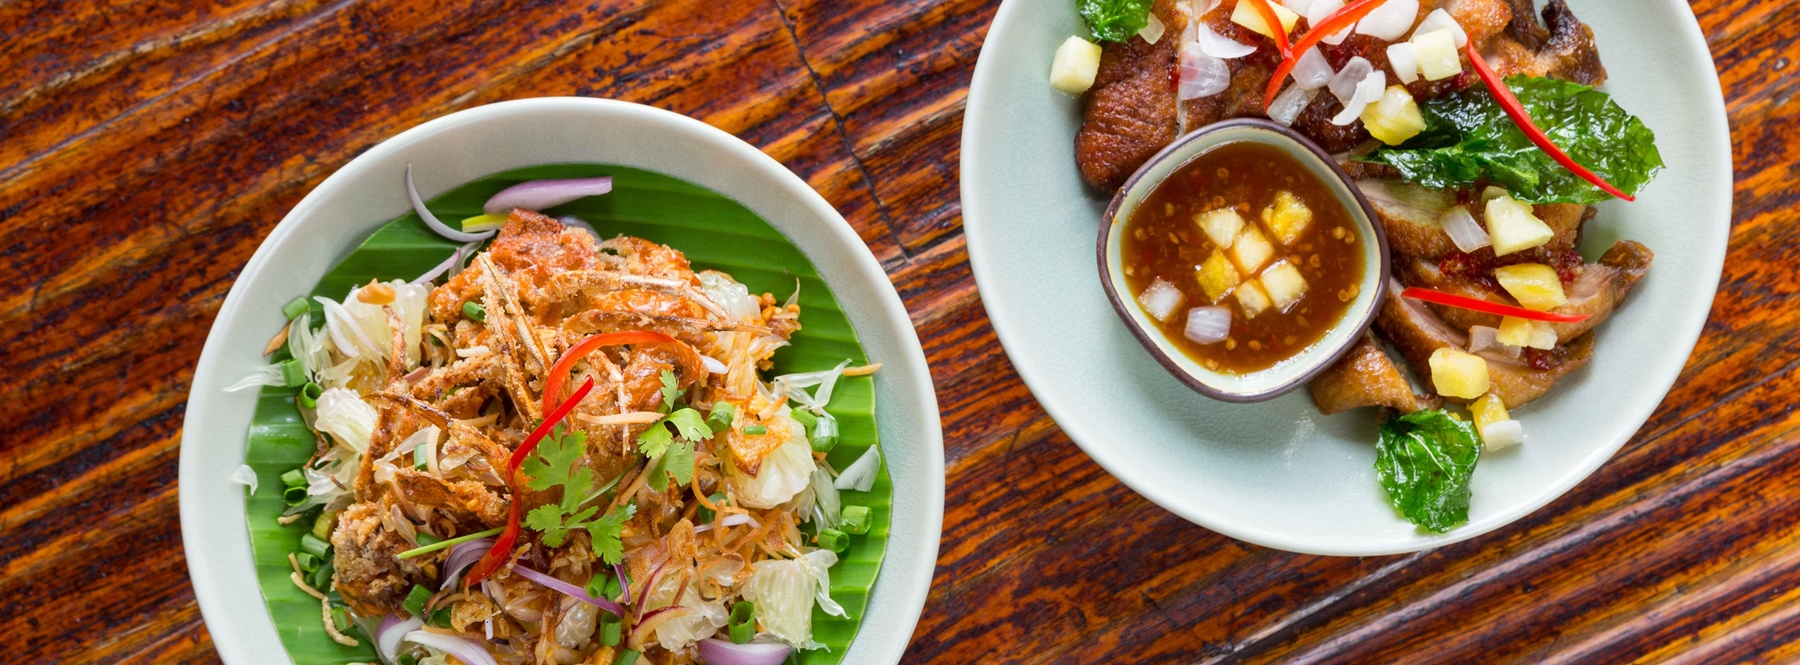 Thai Pomelo Salad with crispy soft shell crab